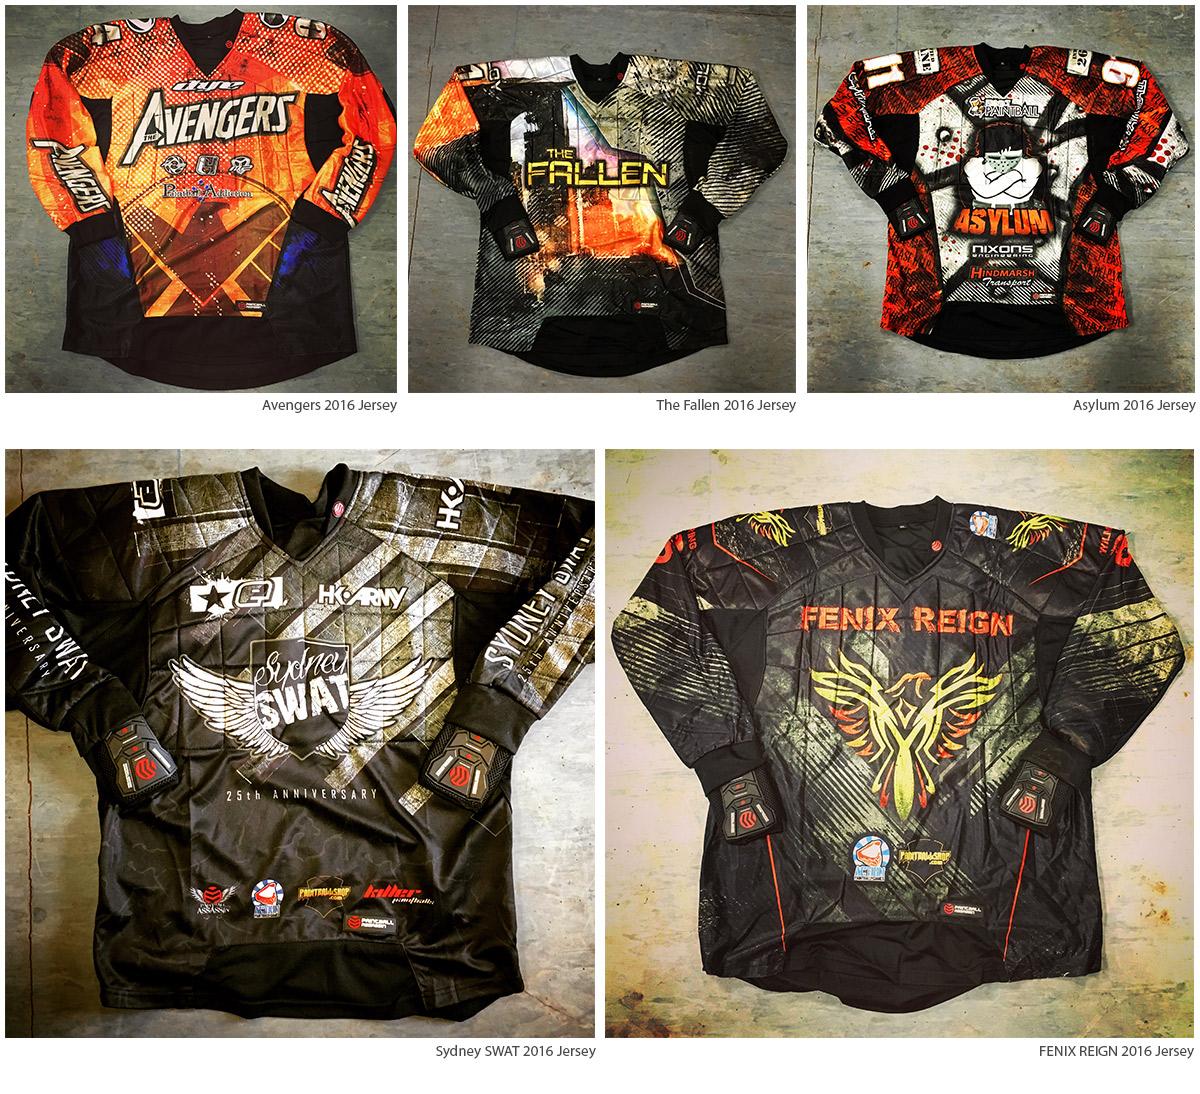 paintballshop-paintball-assassin-custom-jerseys-references.jpg